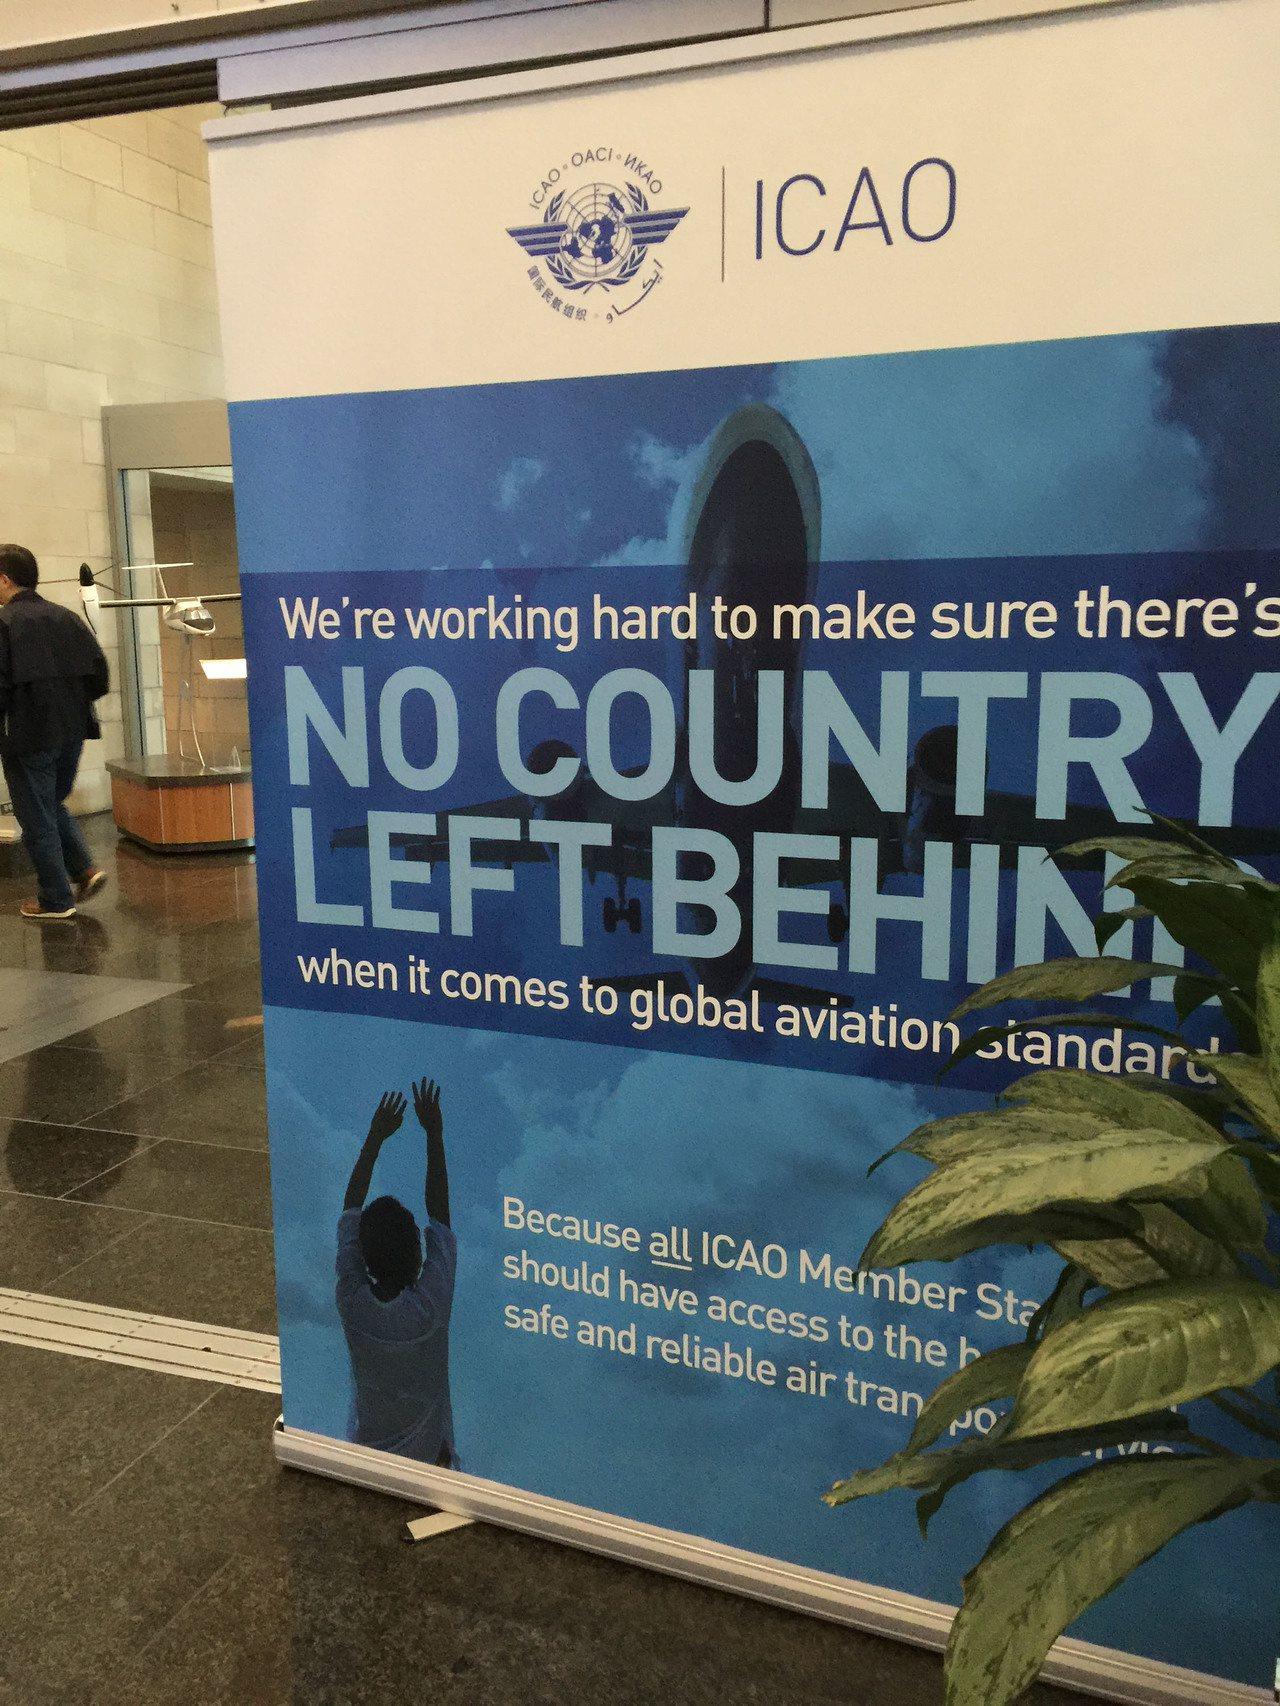 ICAO大會在中國大陸全面打壓下,不僅不發邀請函給台灣,也全面封殺台灣媒體採訪。...